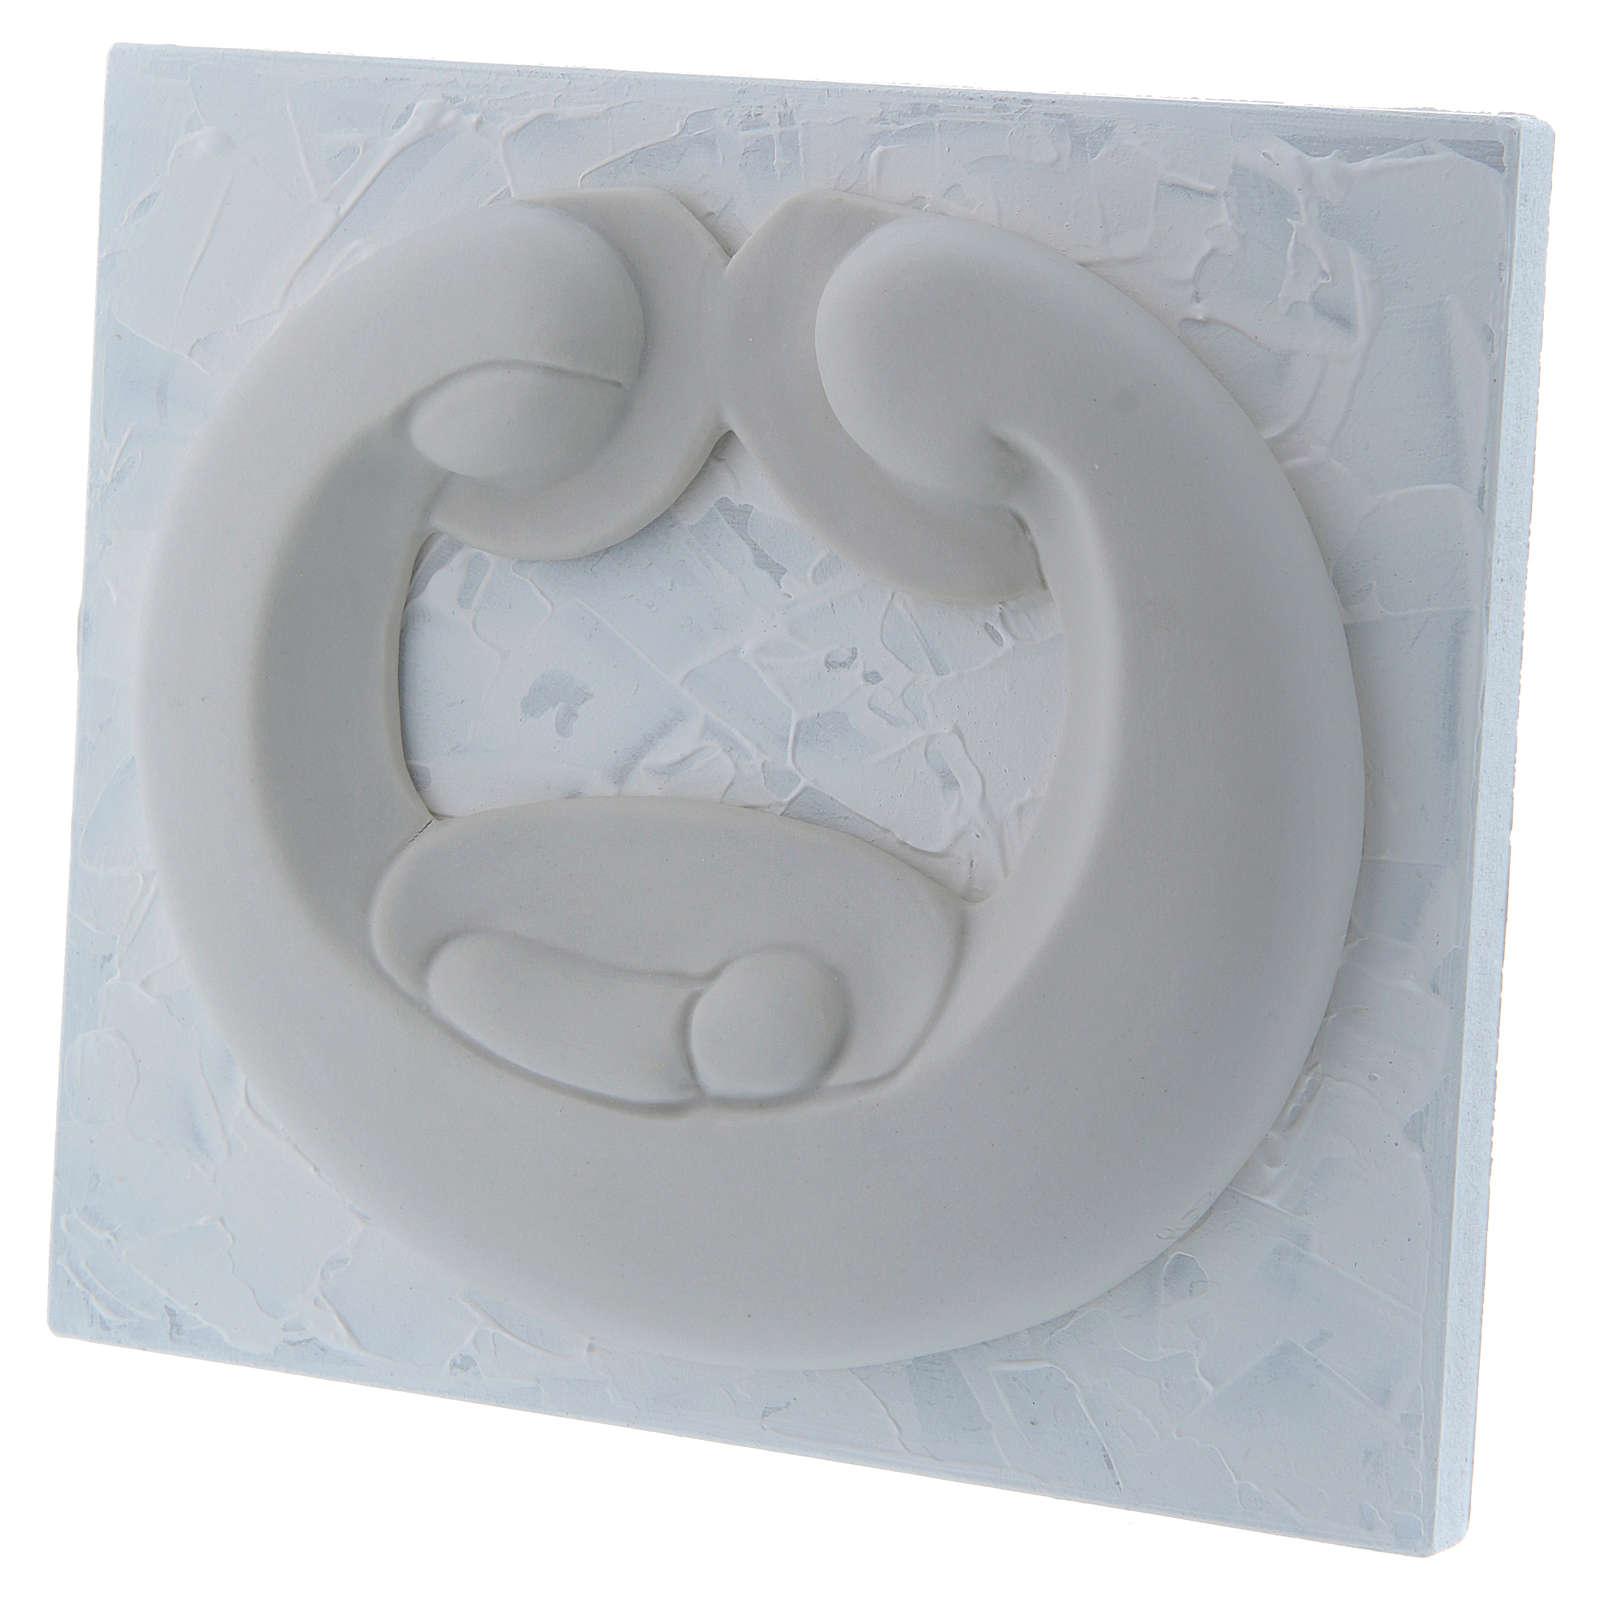 Bajorrelieve de porcelana blanca Pinton Sagrada Familia panel blanco 15x17 cm 4